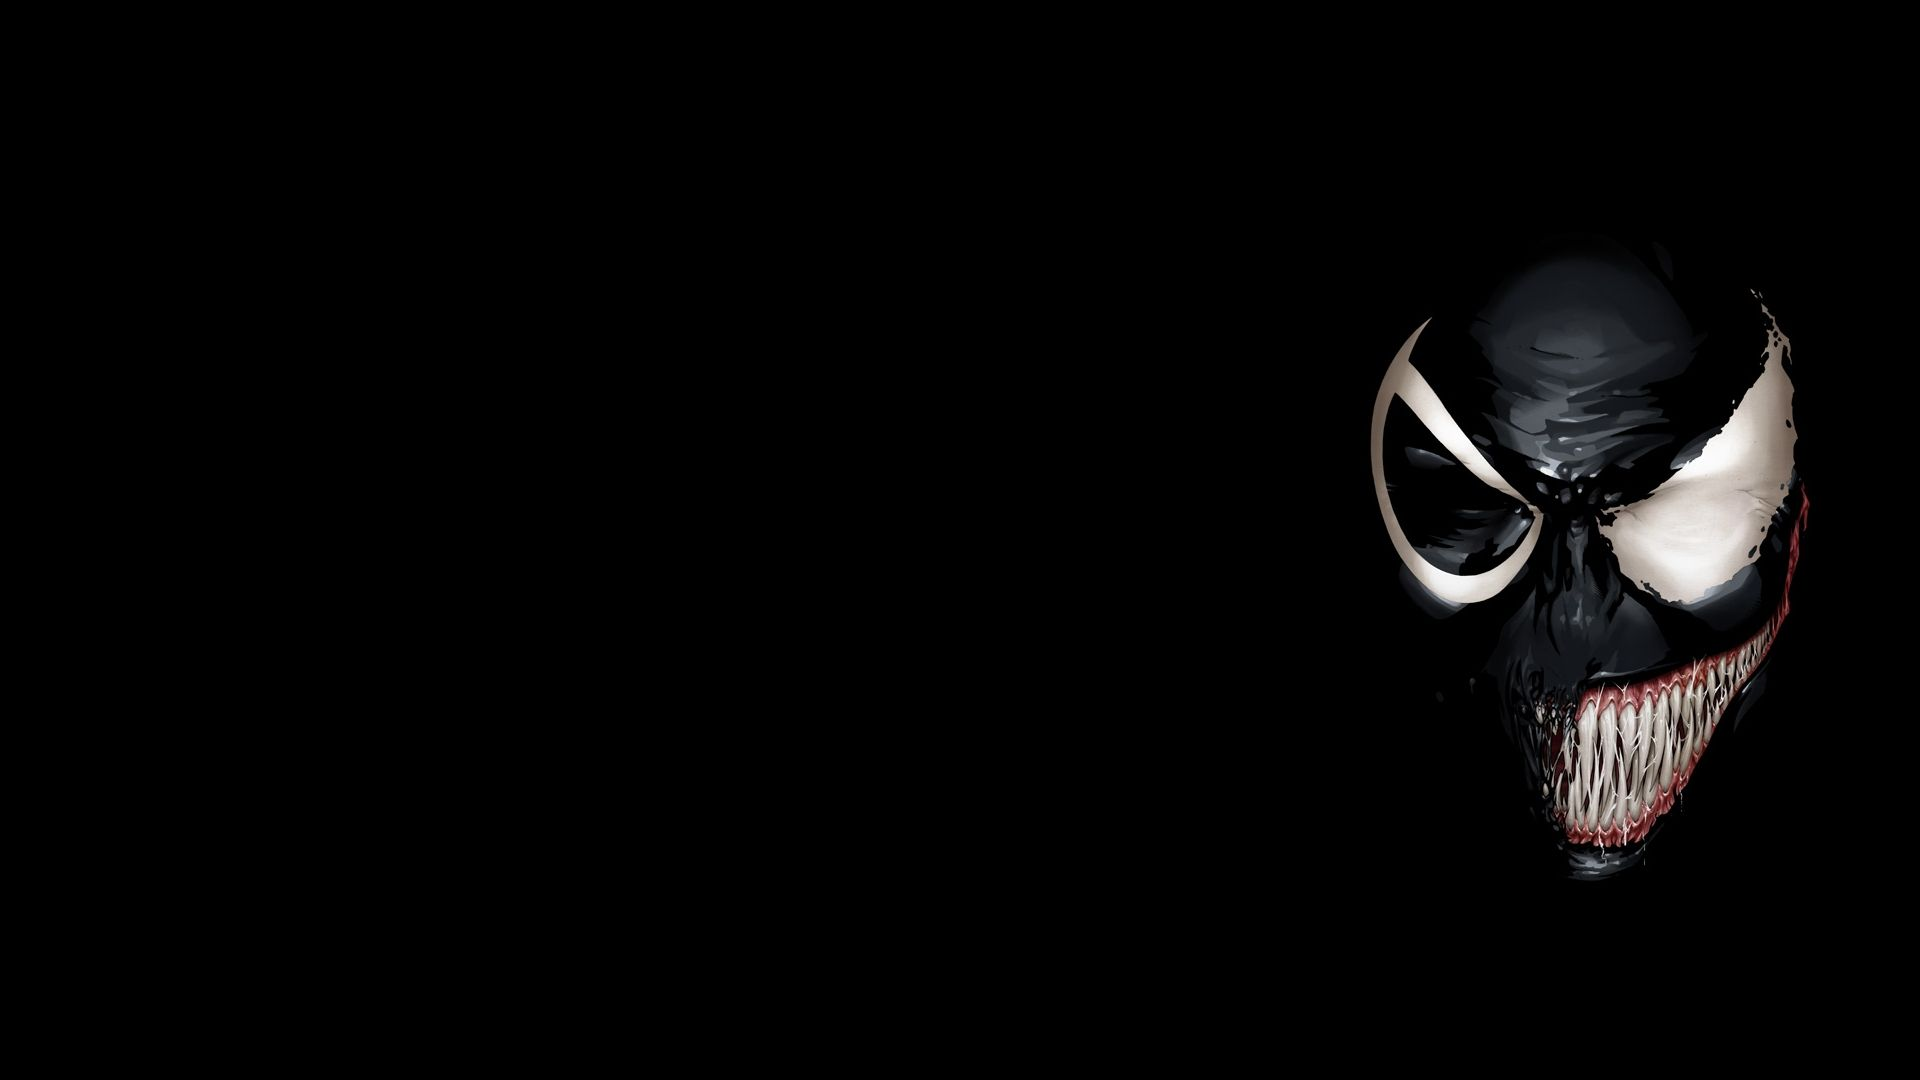 Pin By Al Kennon On Marvel Venom Evil Villain Or Anti Hero